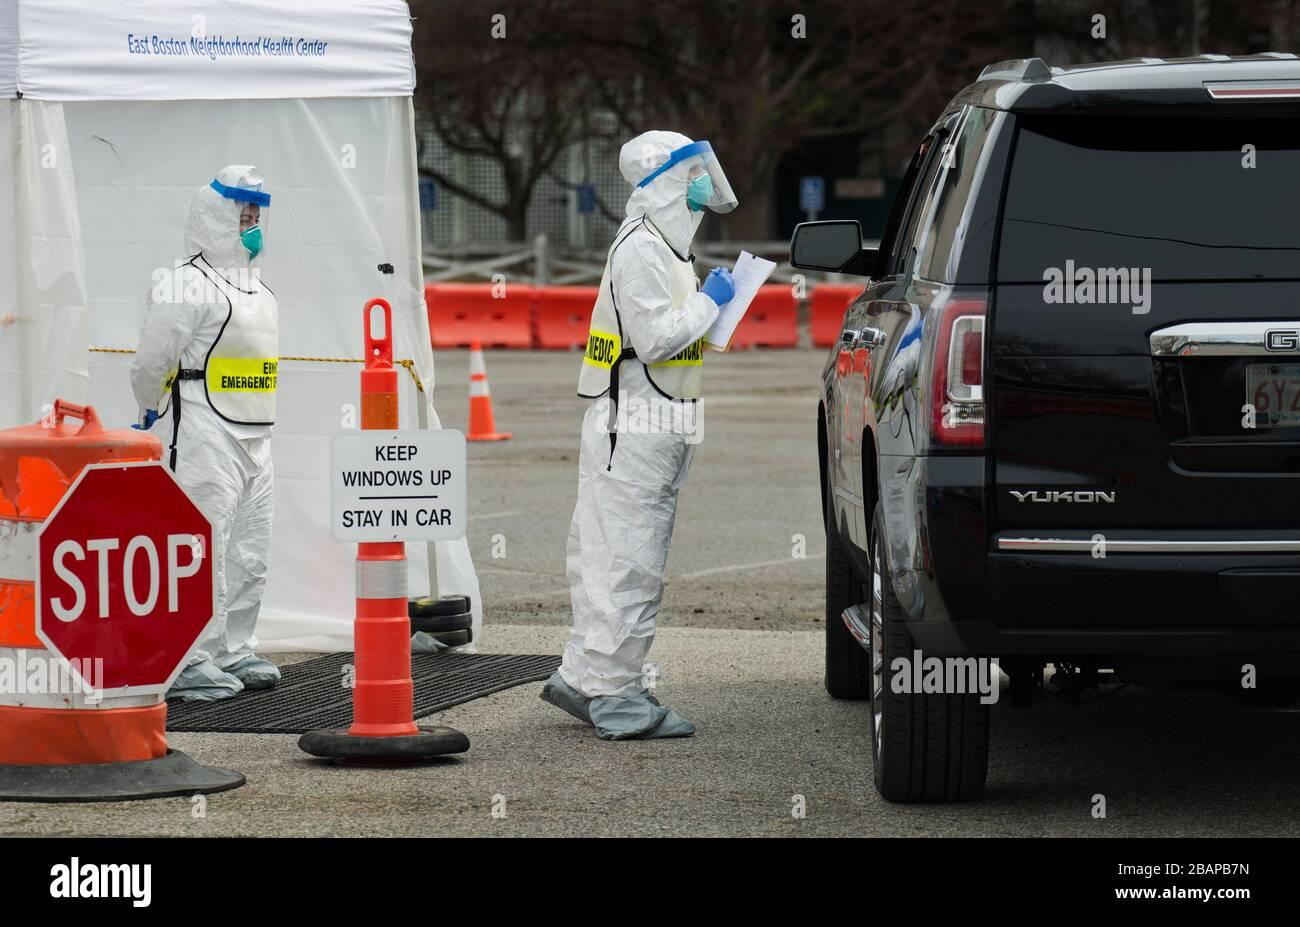 Massachusetts, USA. 28th Mar, 2020. COVID-19 drive-thru testing, Boston, Massachusetts, USA.  28 March 2020. Credit: Chuck Nacke/Alamy Live News Stock Photo